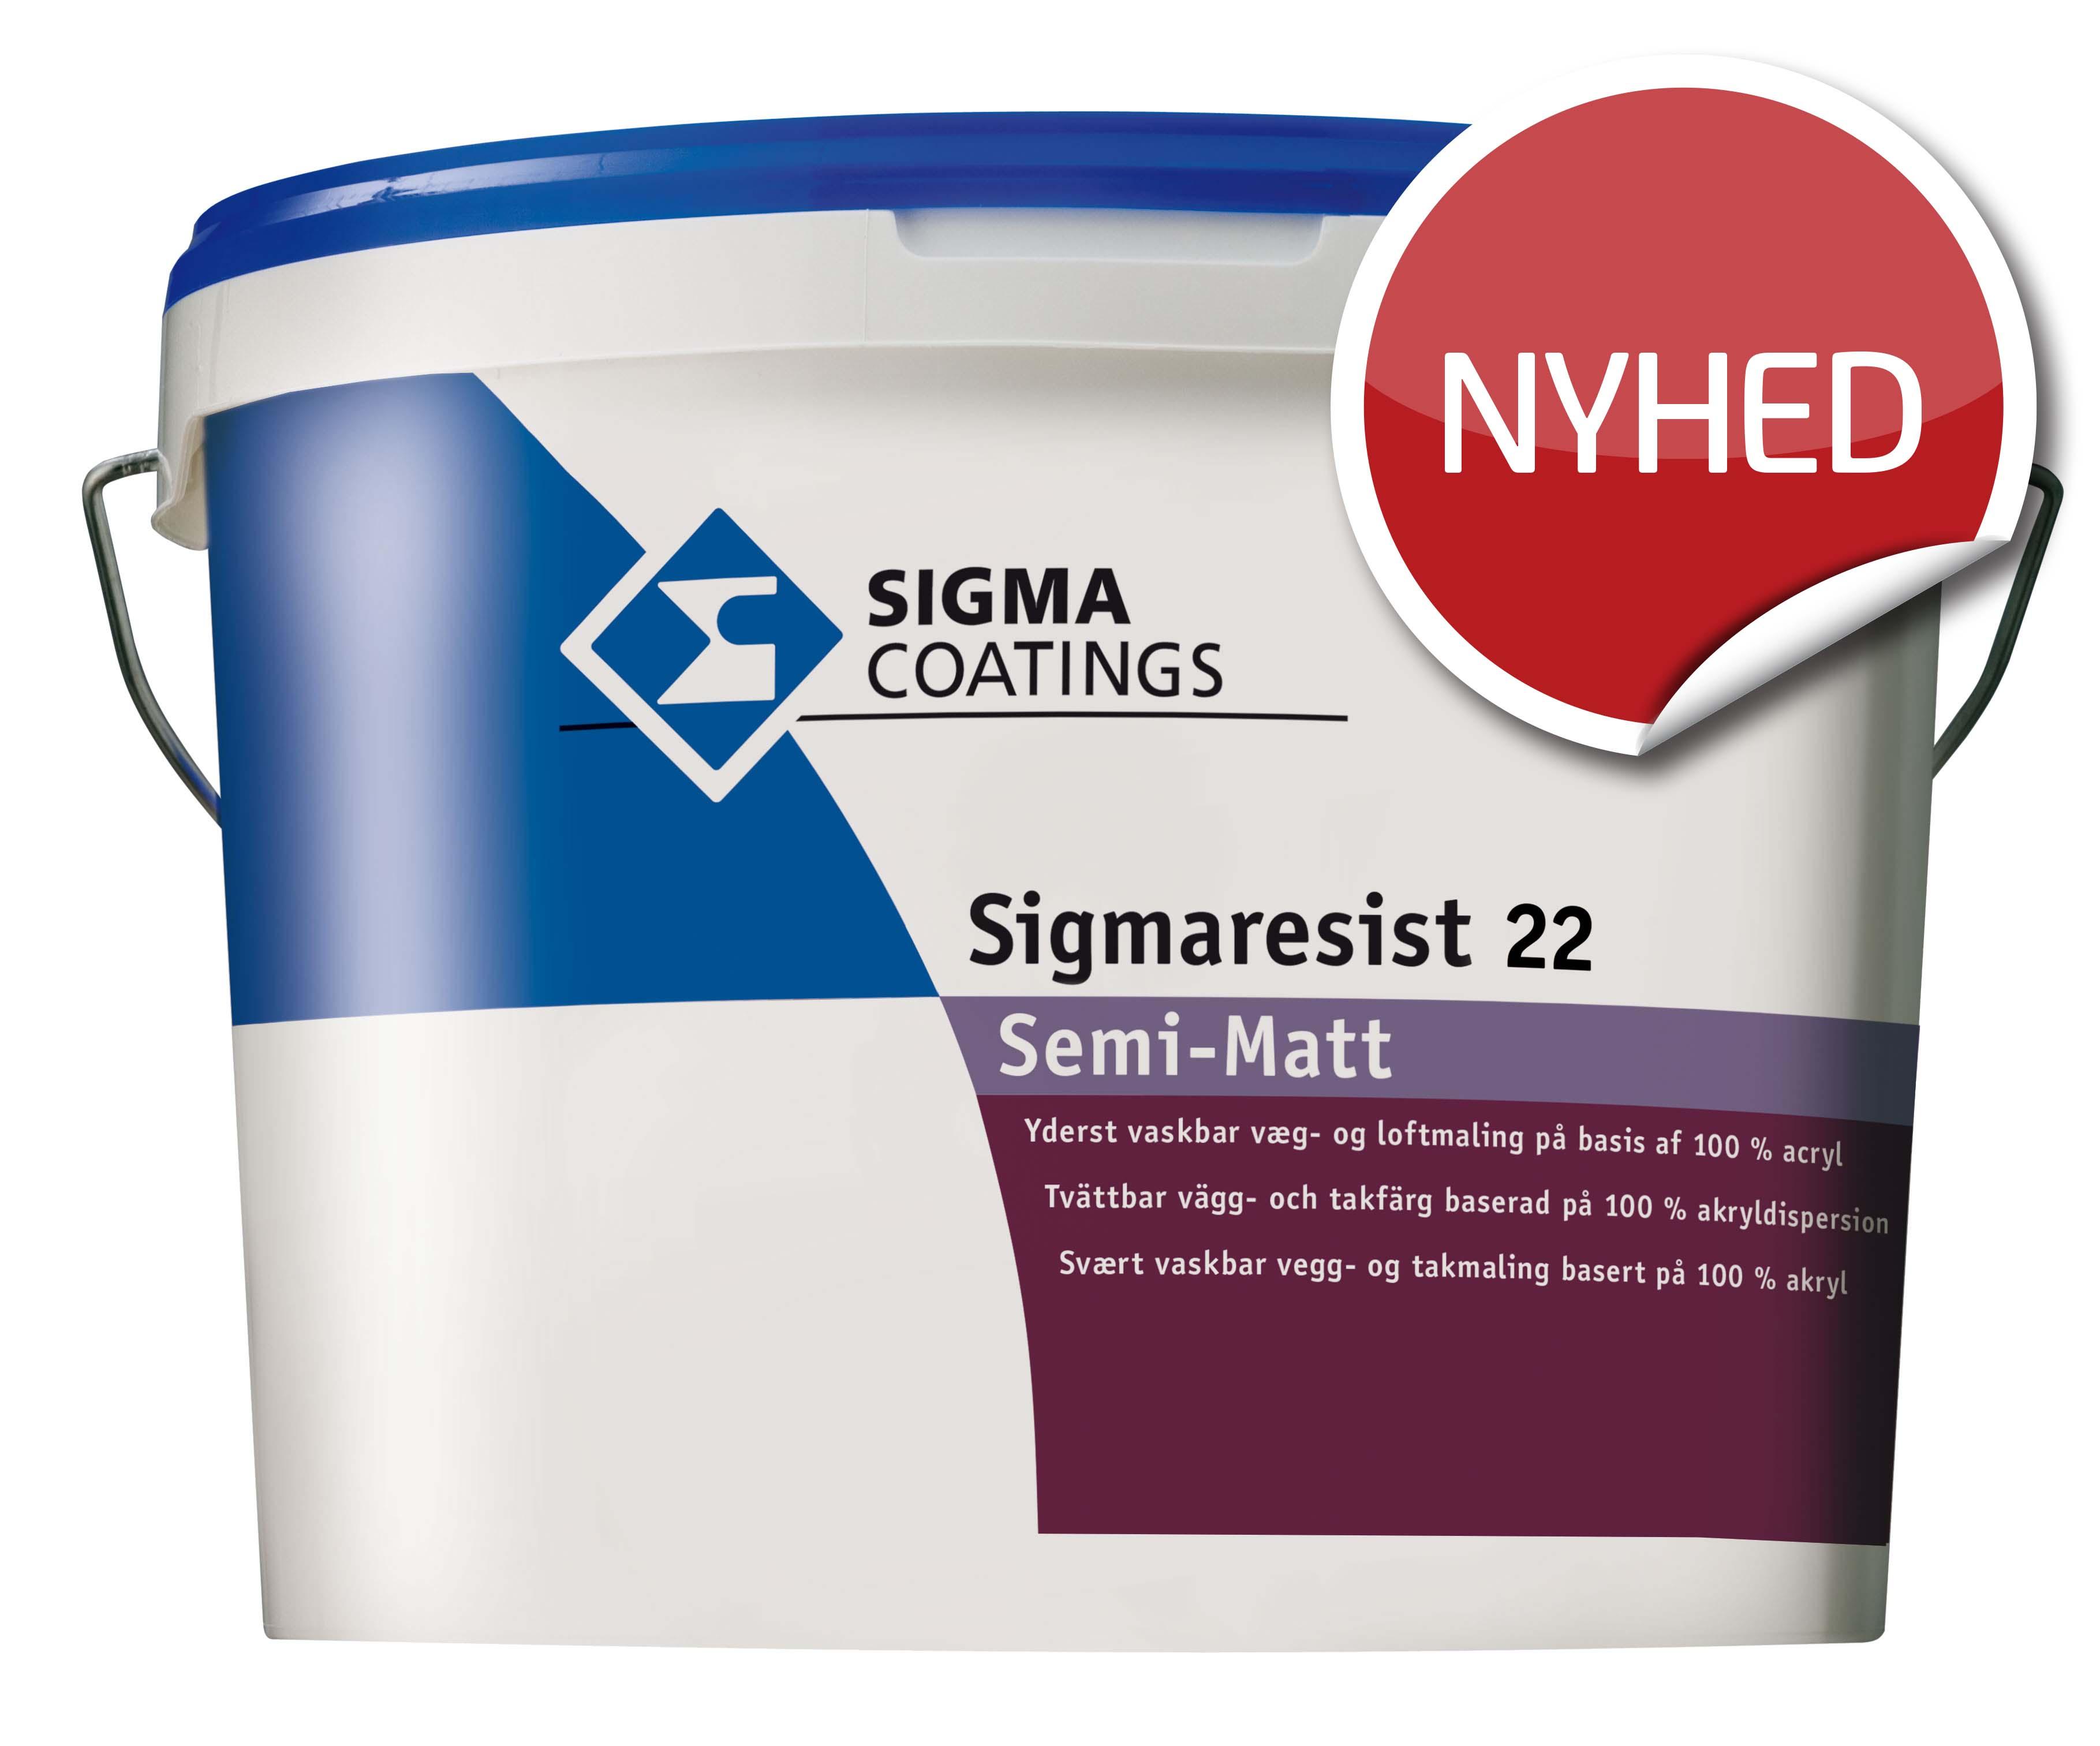 Sigmaresist 22